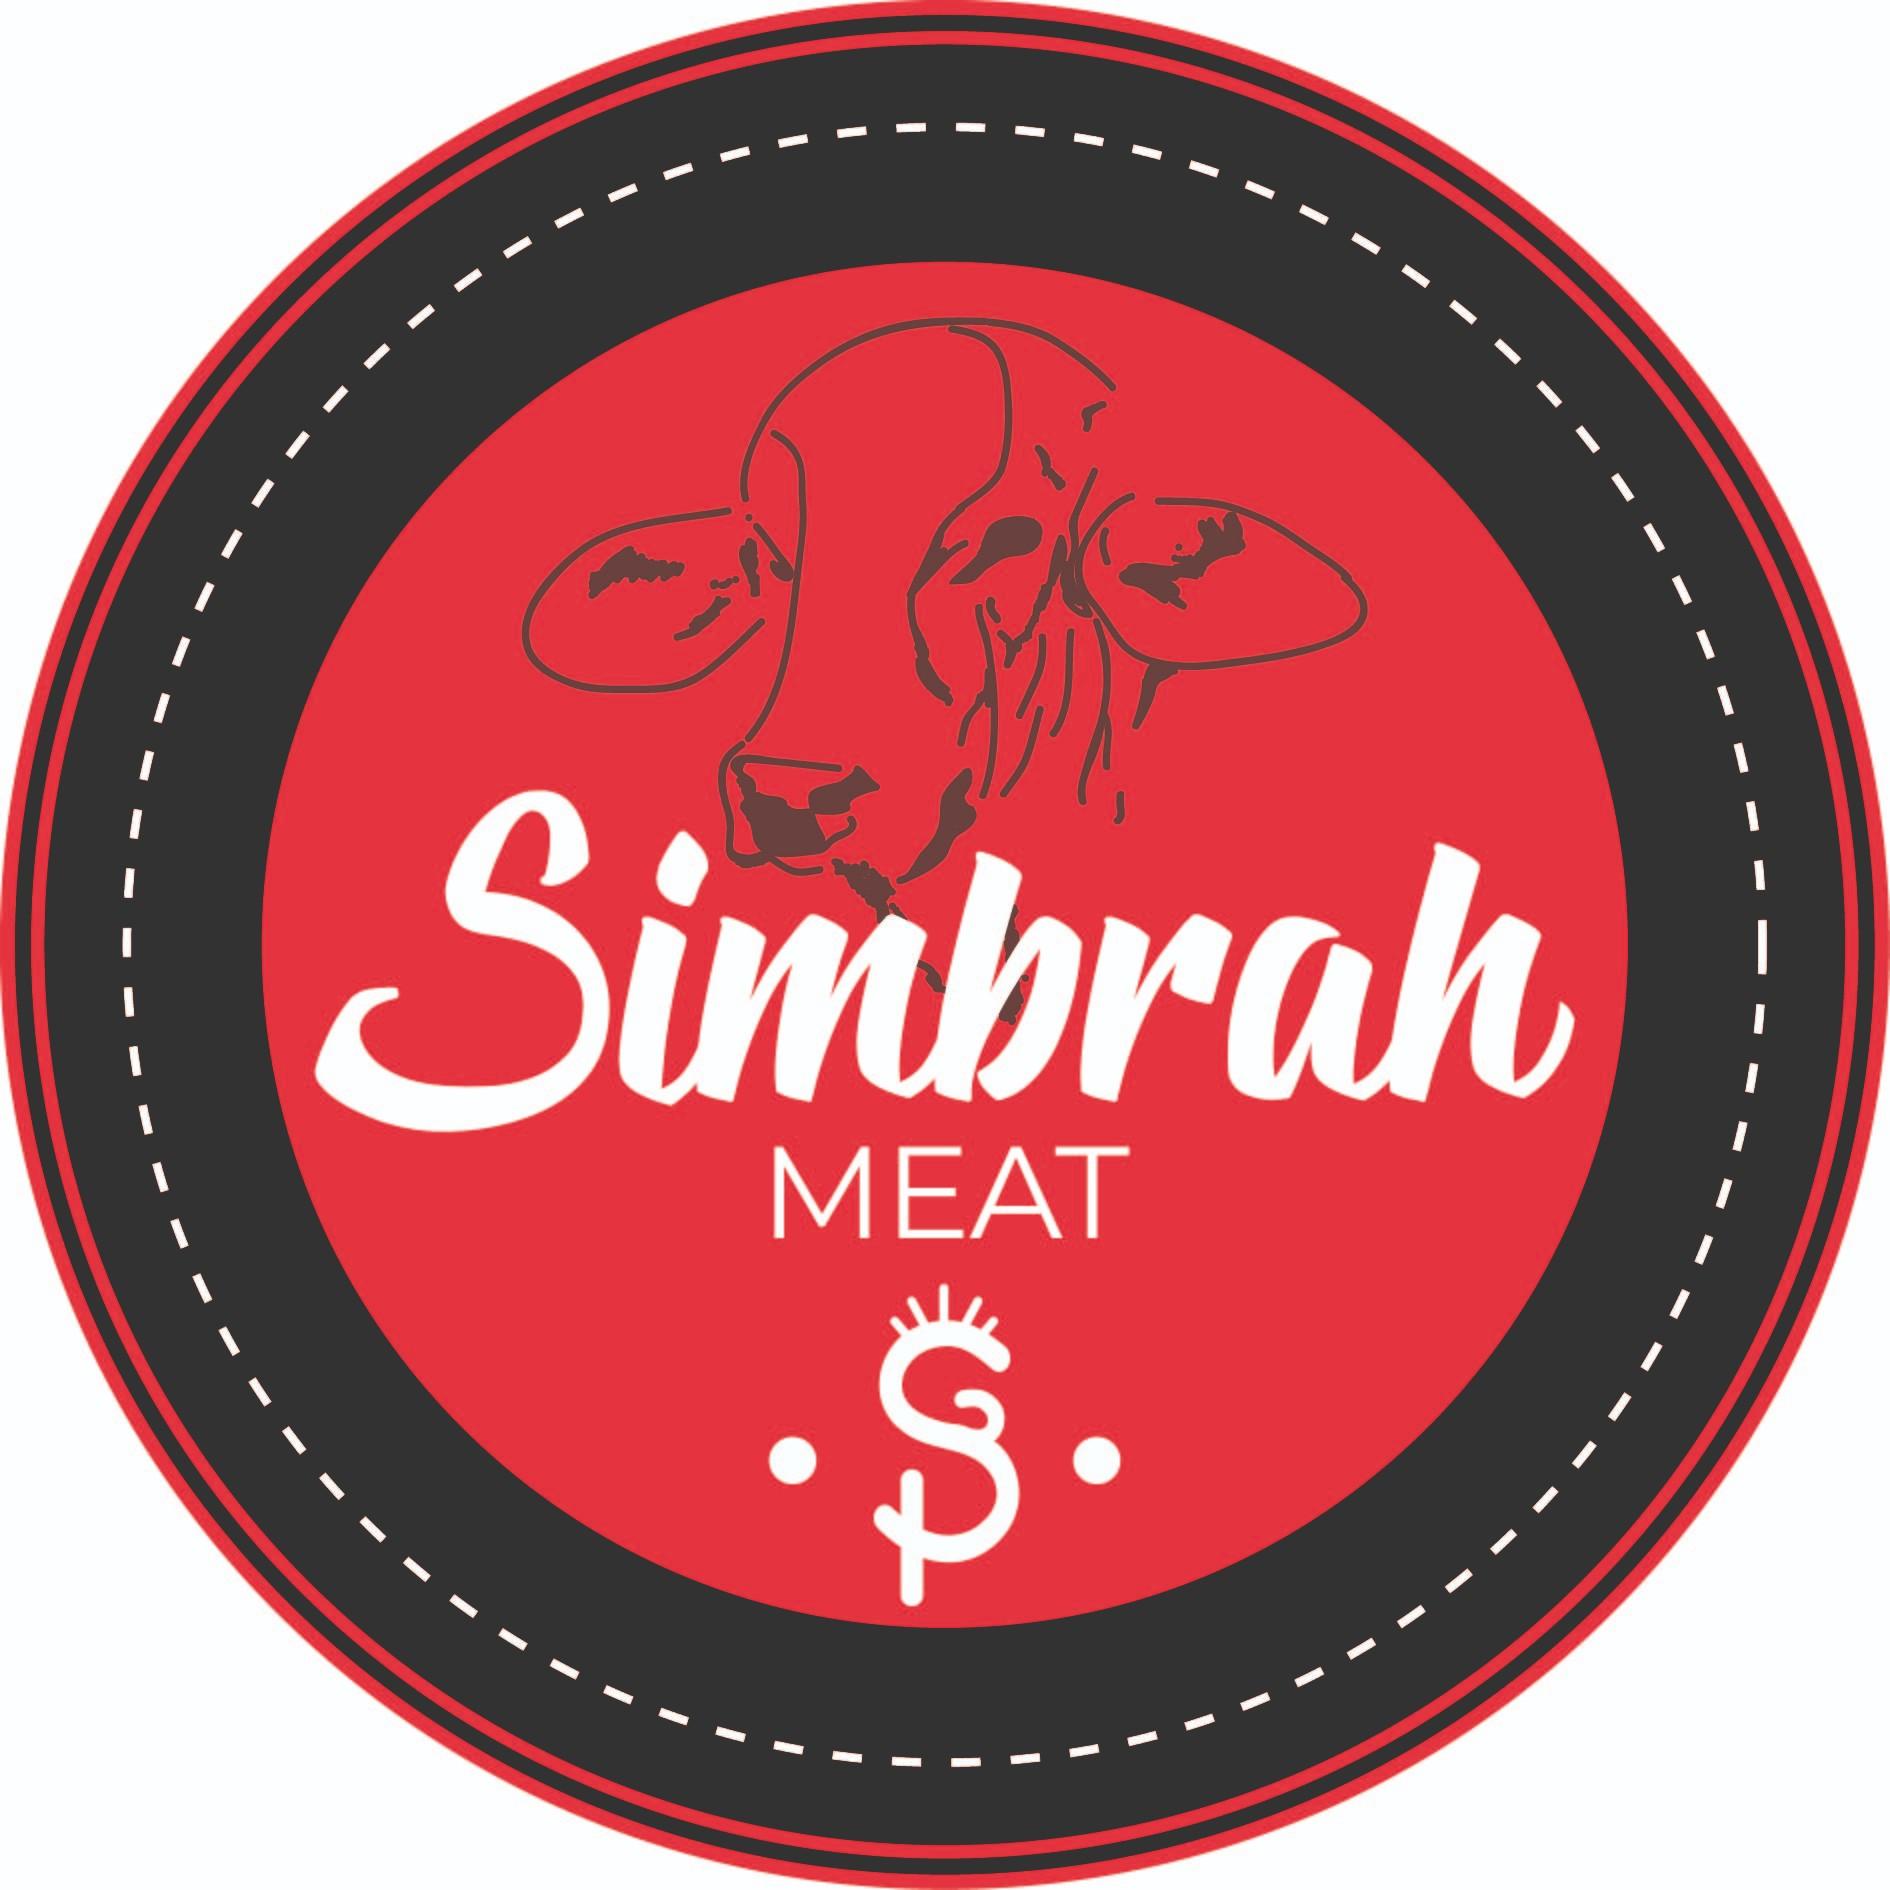 Simbrah Meat S.A.S